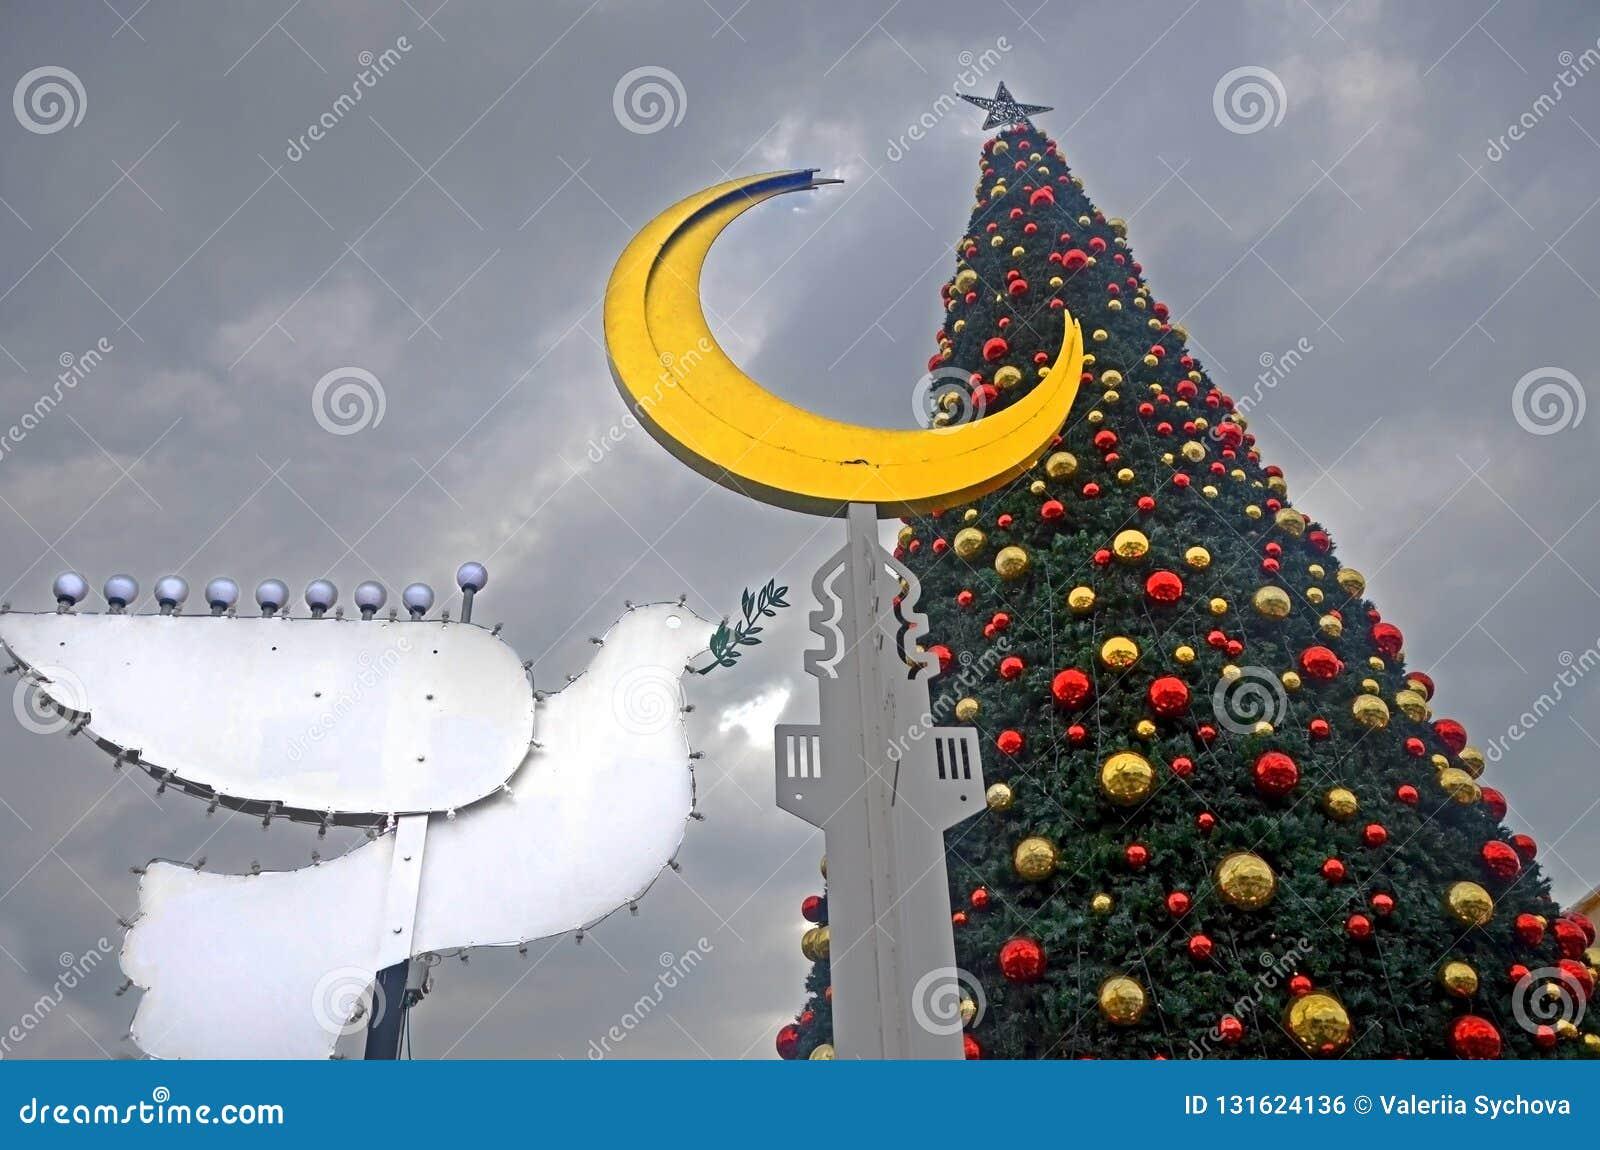 HAIFA, ISRAEL - DECEMBER 30, 2017: Holiday decorations street for holidays, Christmas tree and Hanukkah menorah in the form of a